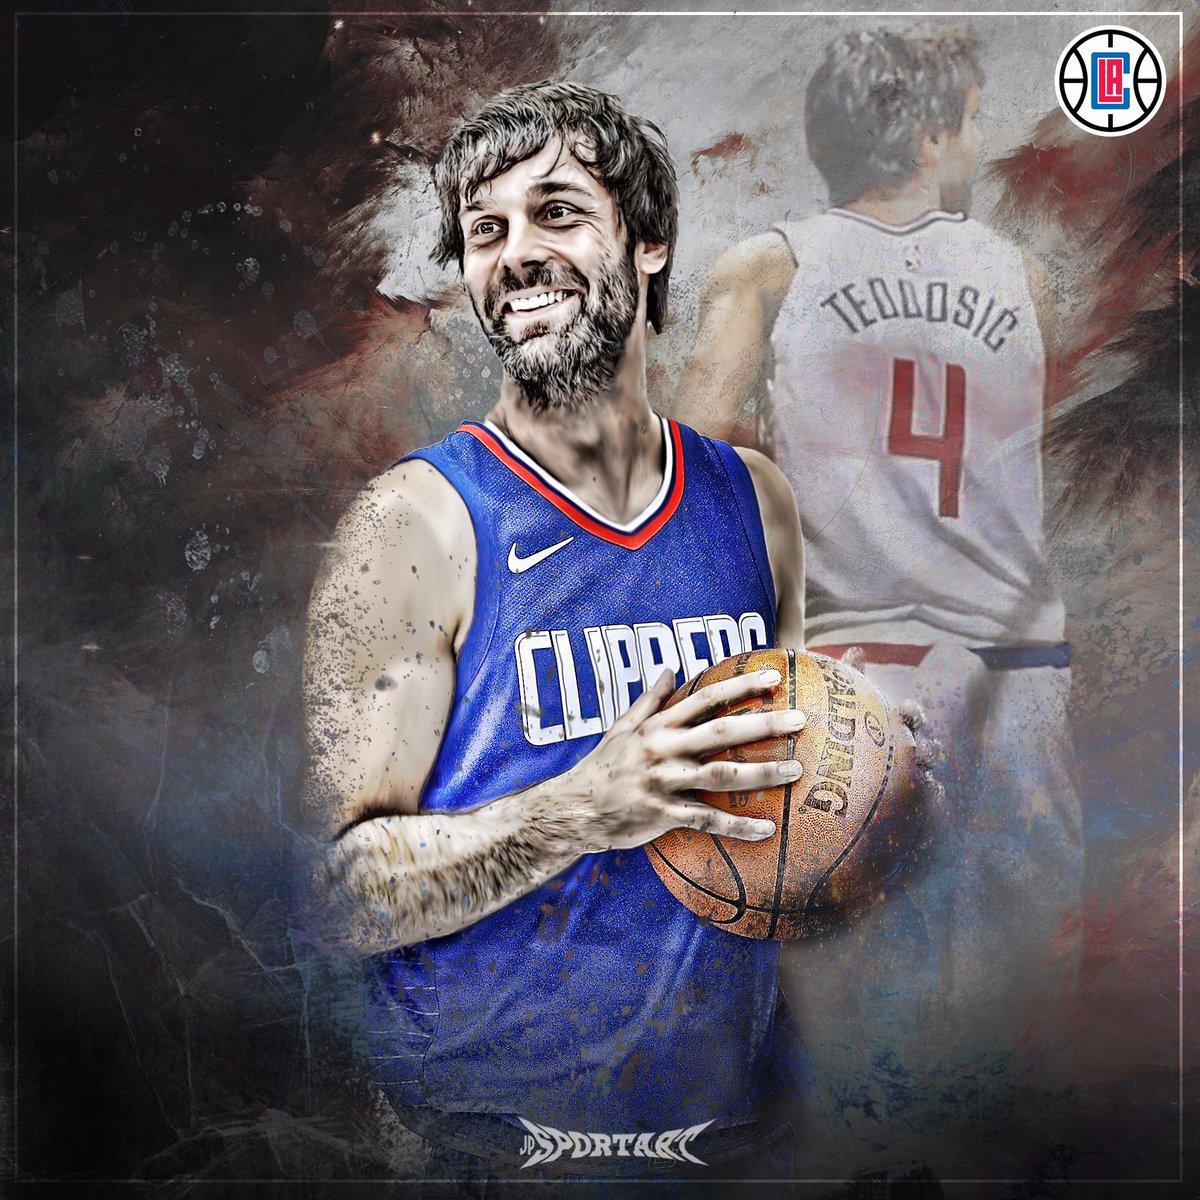 New Era! #Teodosic #Clippers #clippernation #NBA #artwork https://t.co...